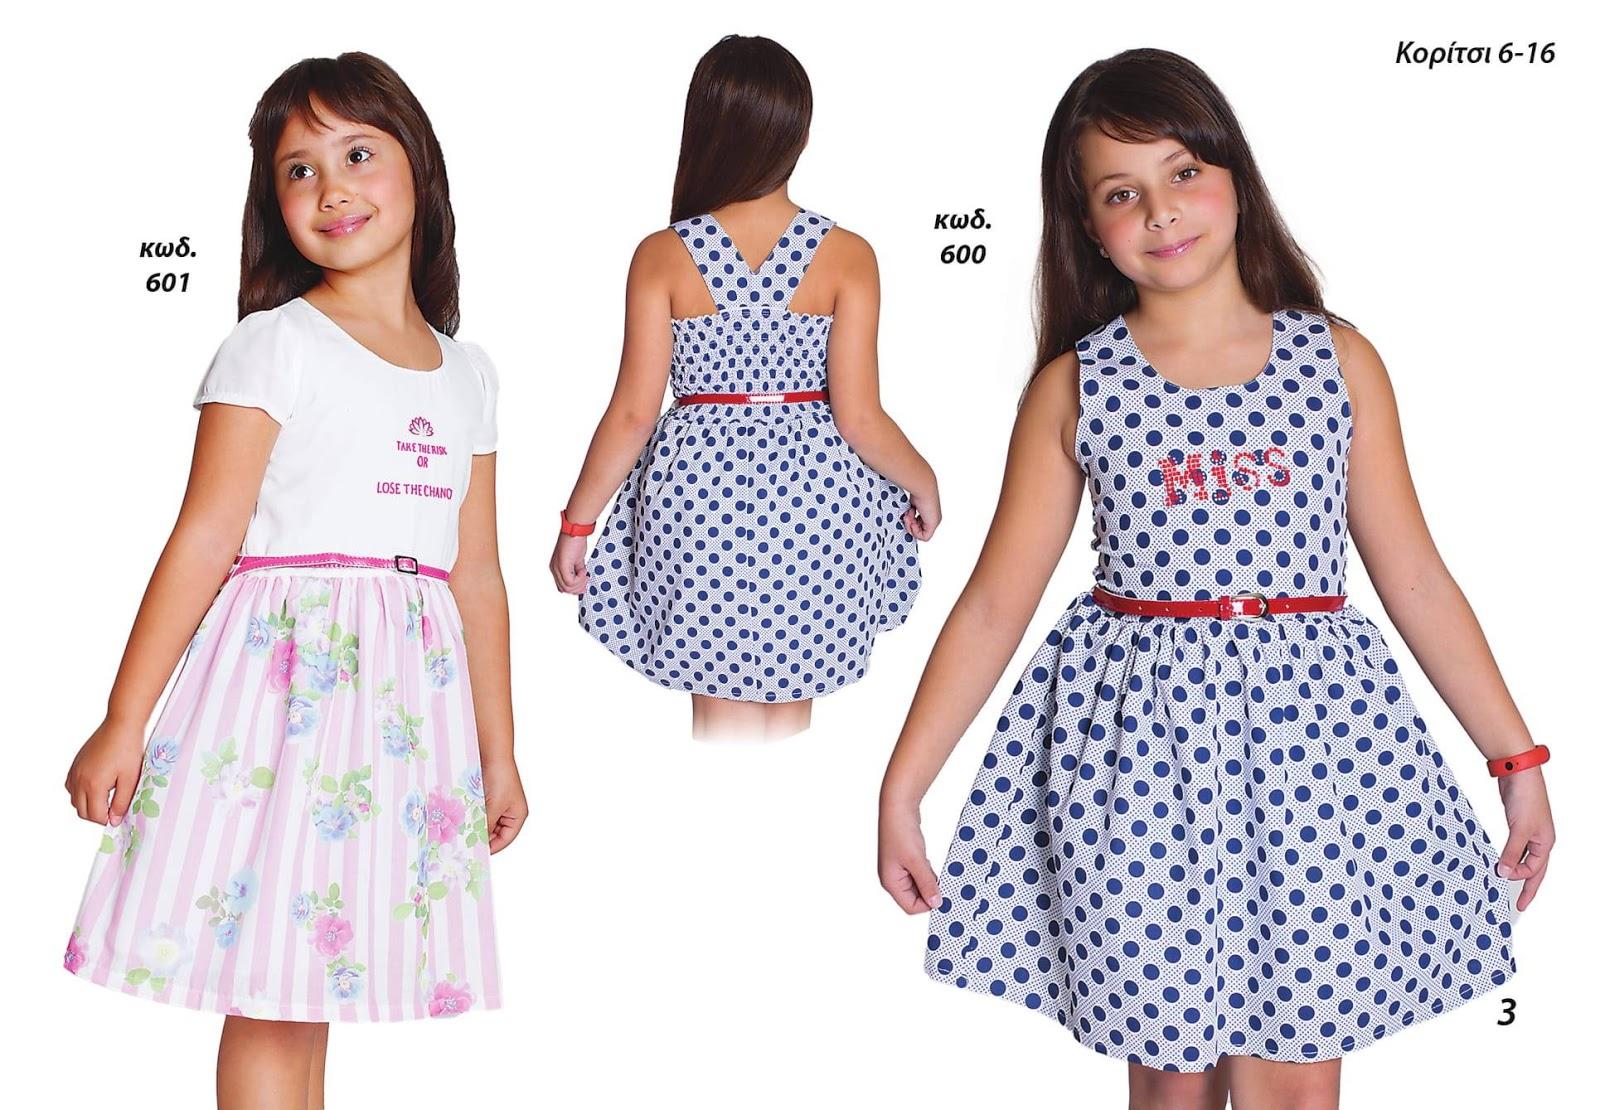 4d9b7165b4a Βιοτεχνία παιδικών ενδυμάτων Ελληνικής κατασκευής. Διαθέσιμα για χονδρική  και λιανική πώληση. Ευαλκίδου 35 Σεπόλια -Αθήνα